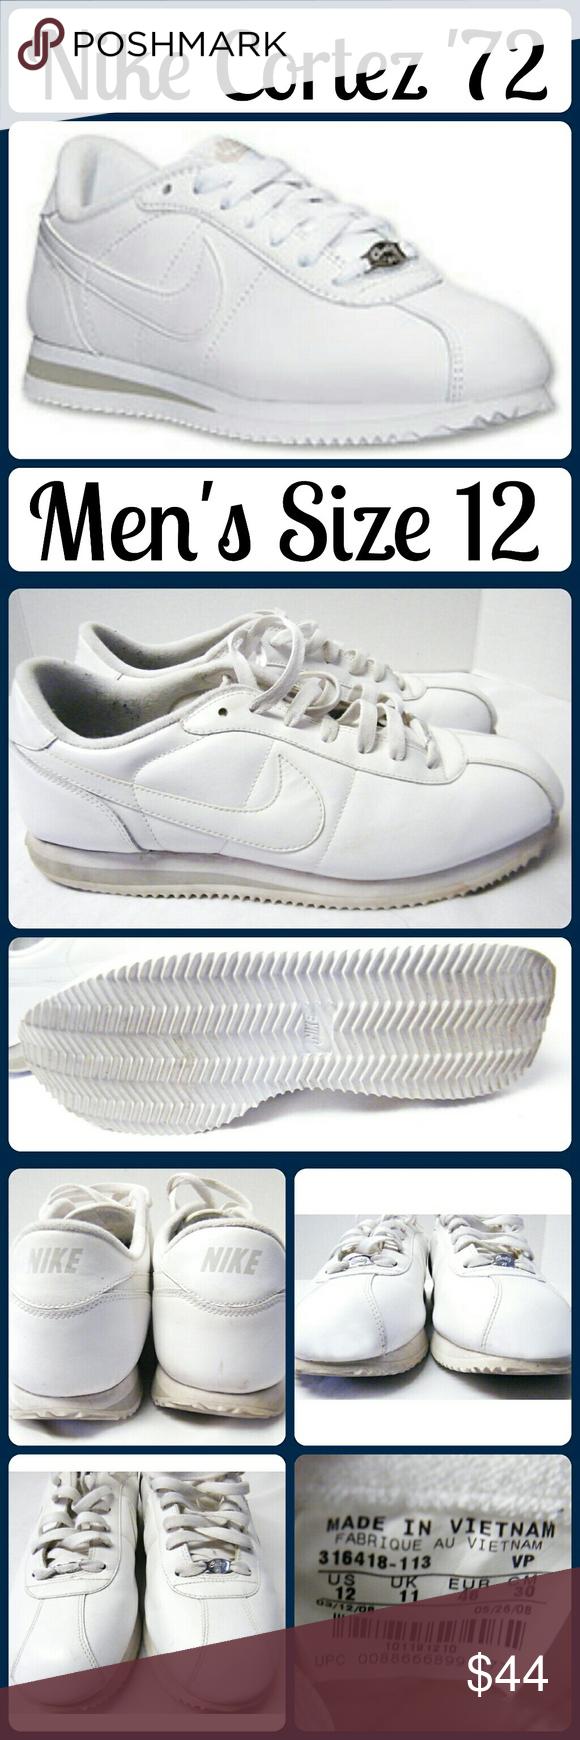 a6c8414dd327 ... netherlands mens sz 12 nike cortez 72 tennis shoes excellent new like  condition sz 12 ef62b